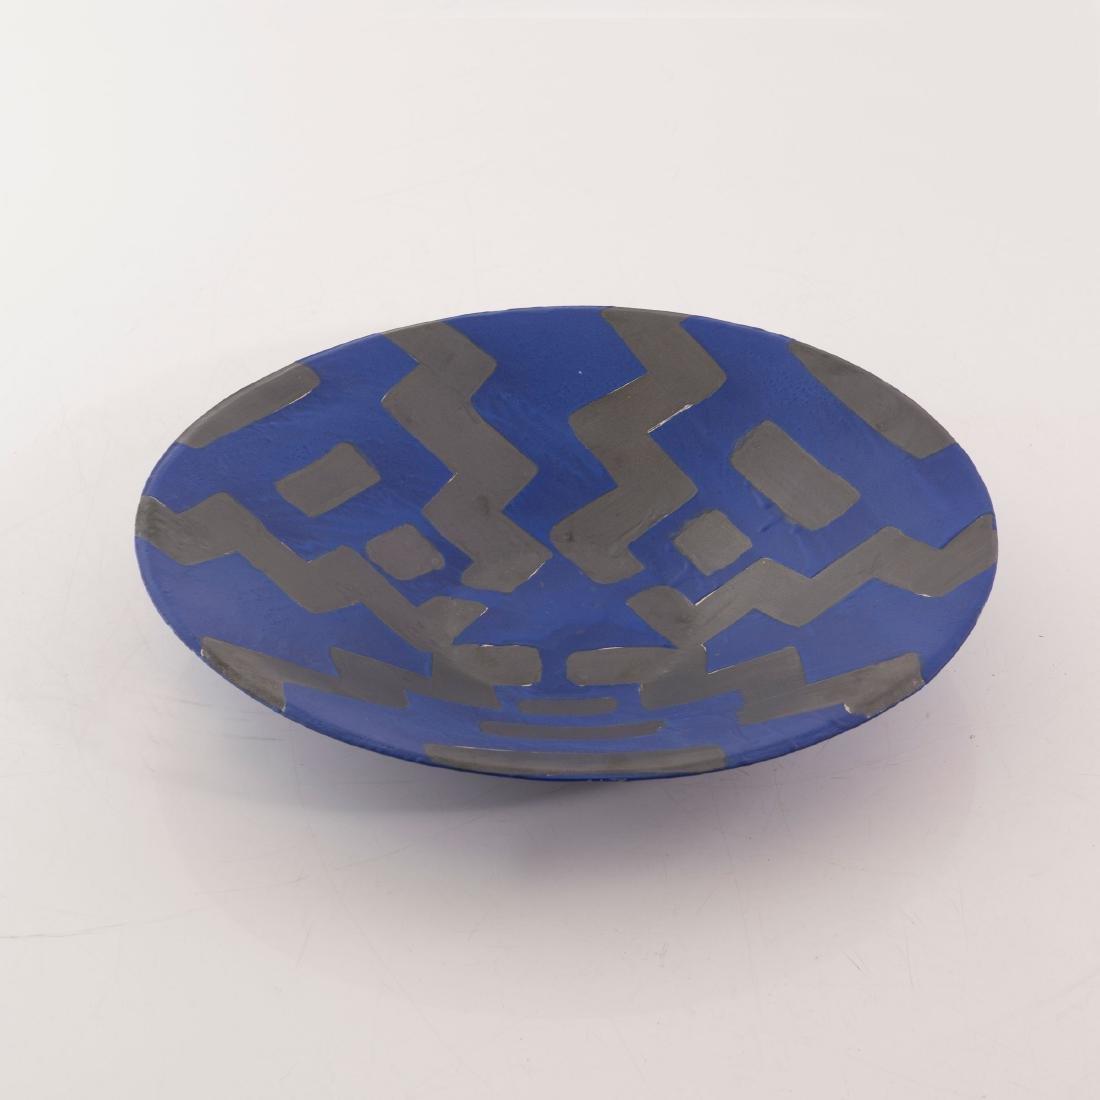 Large 'African' bowl, 1991 - 4